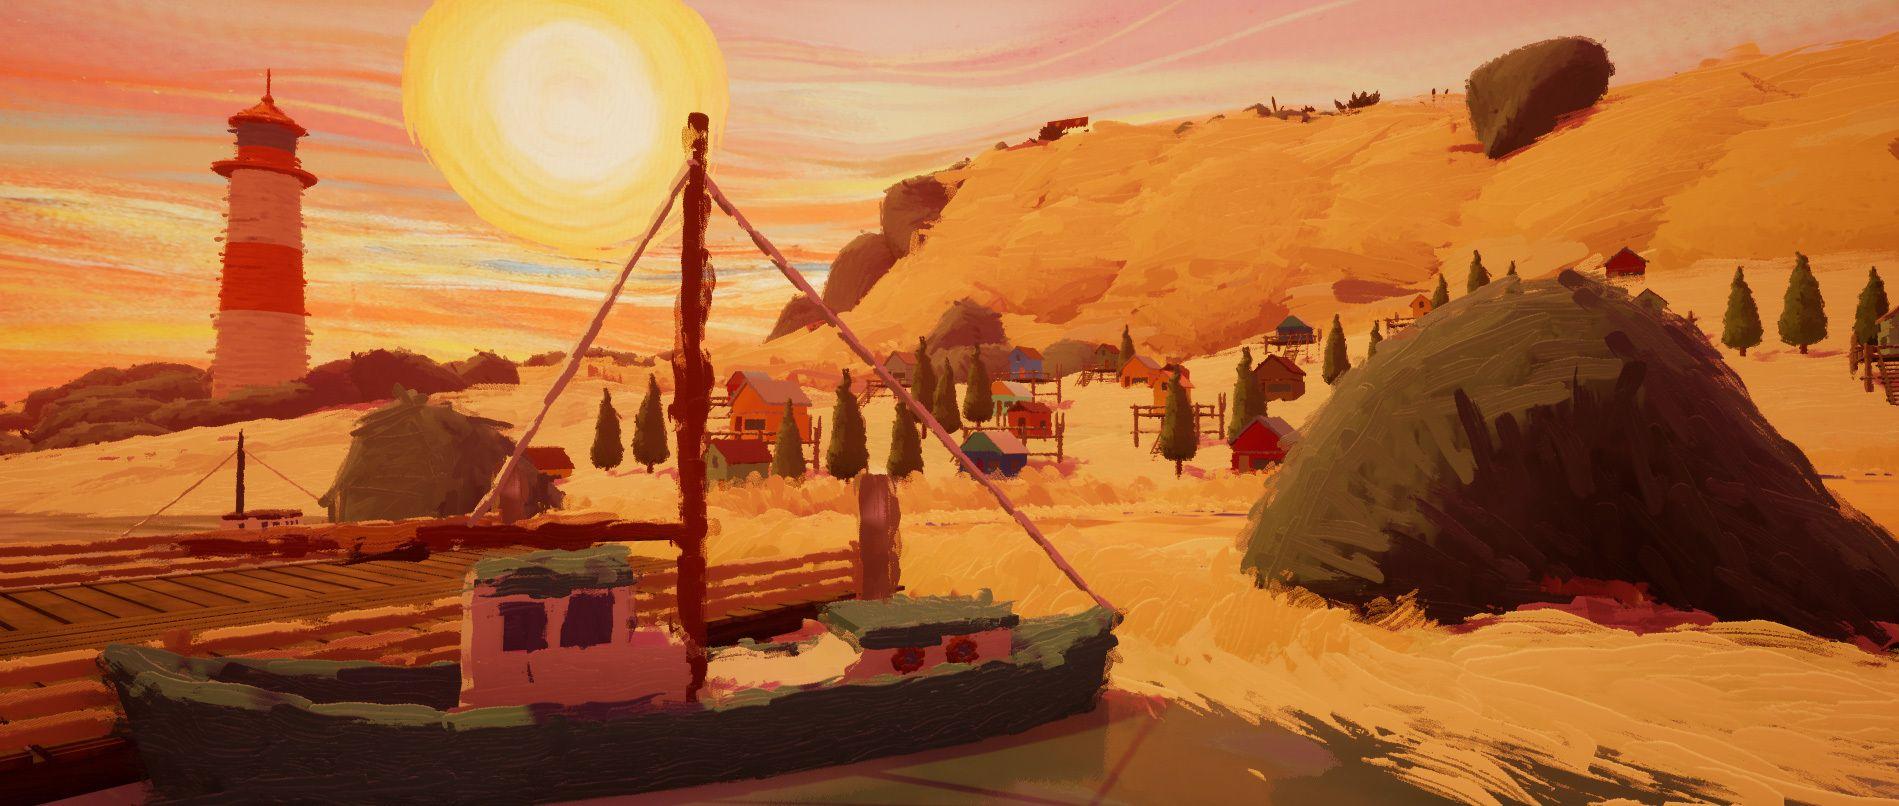 Pin by Daniel Doan on Neat Game Development Stuff | Atlus